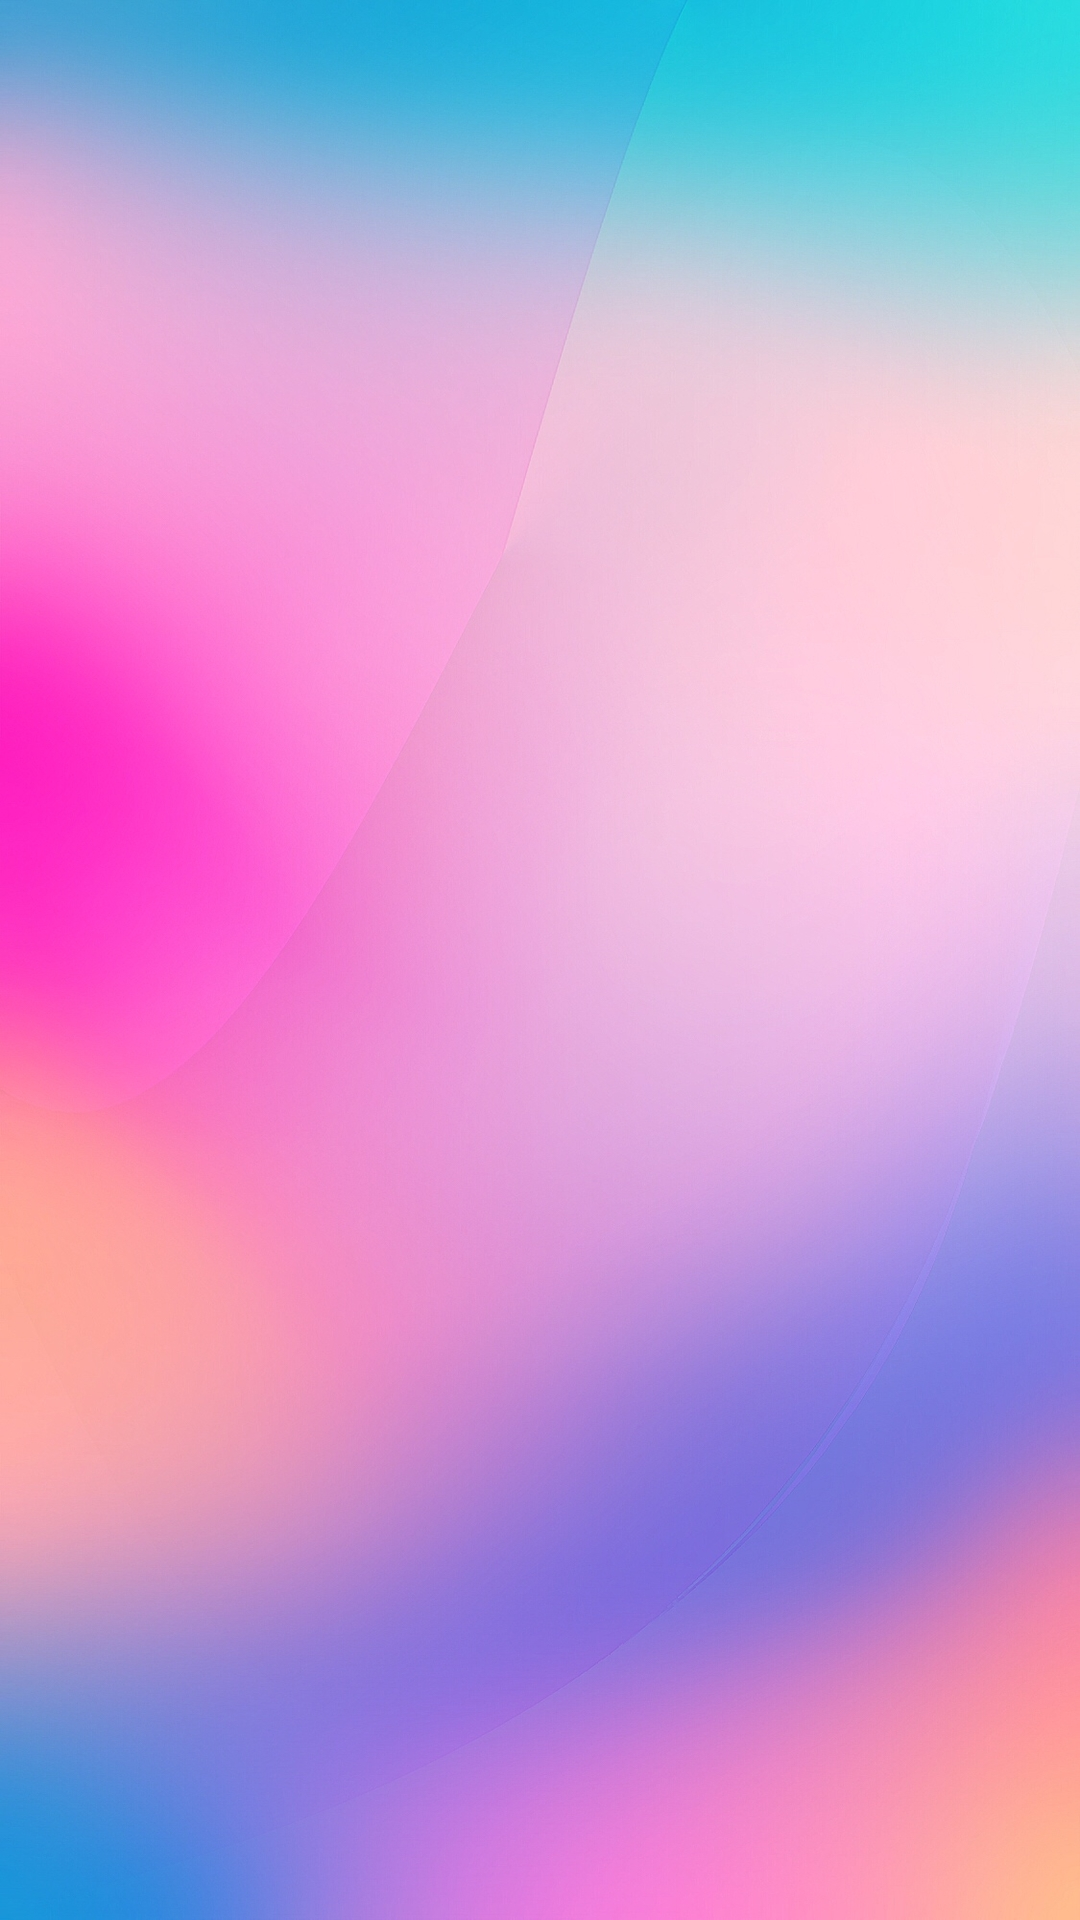 Iphone 8 X Wallpaper خلفيات لمزيج من الألوان المتناغمة لهاتف Iphone عالم آبل